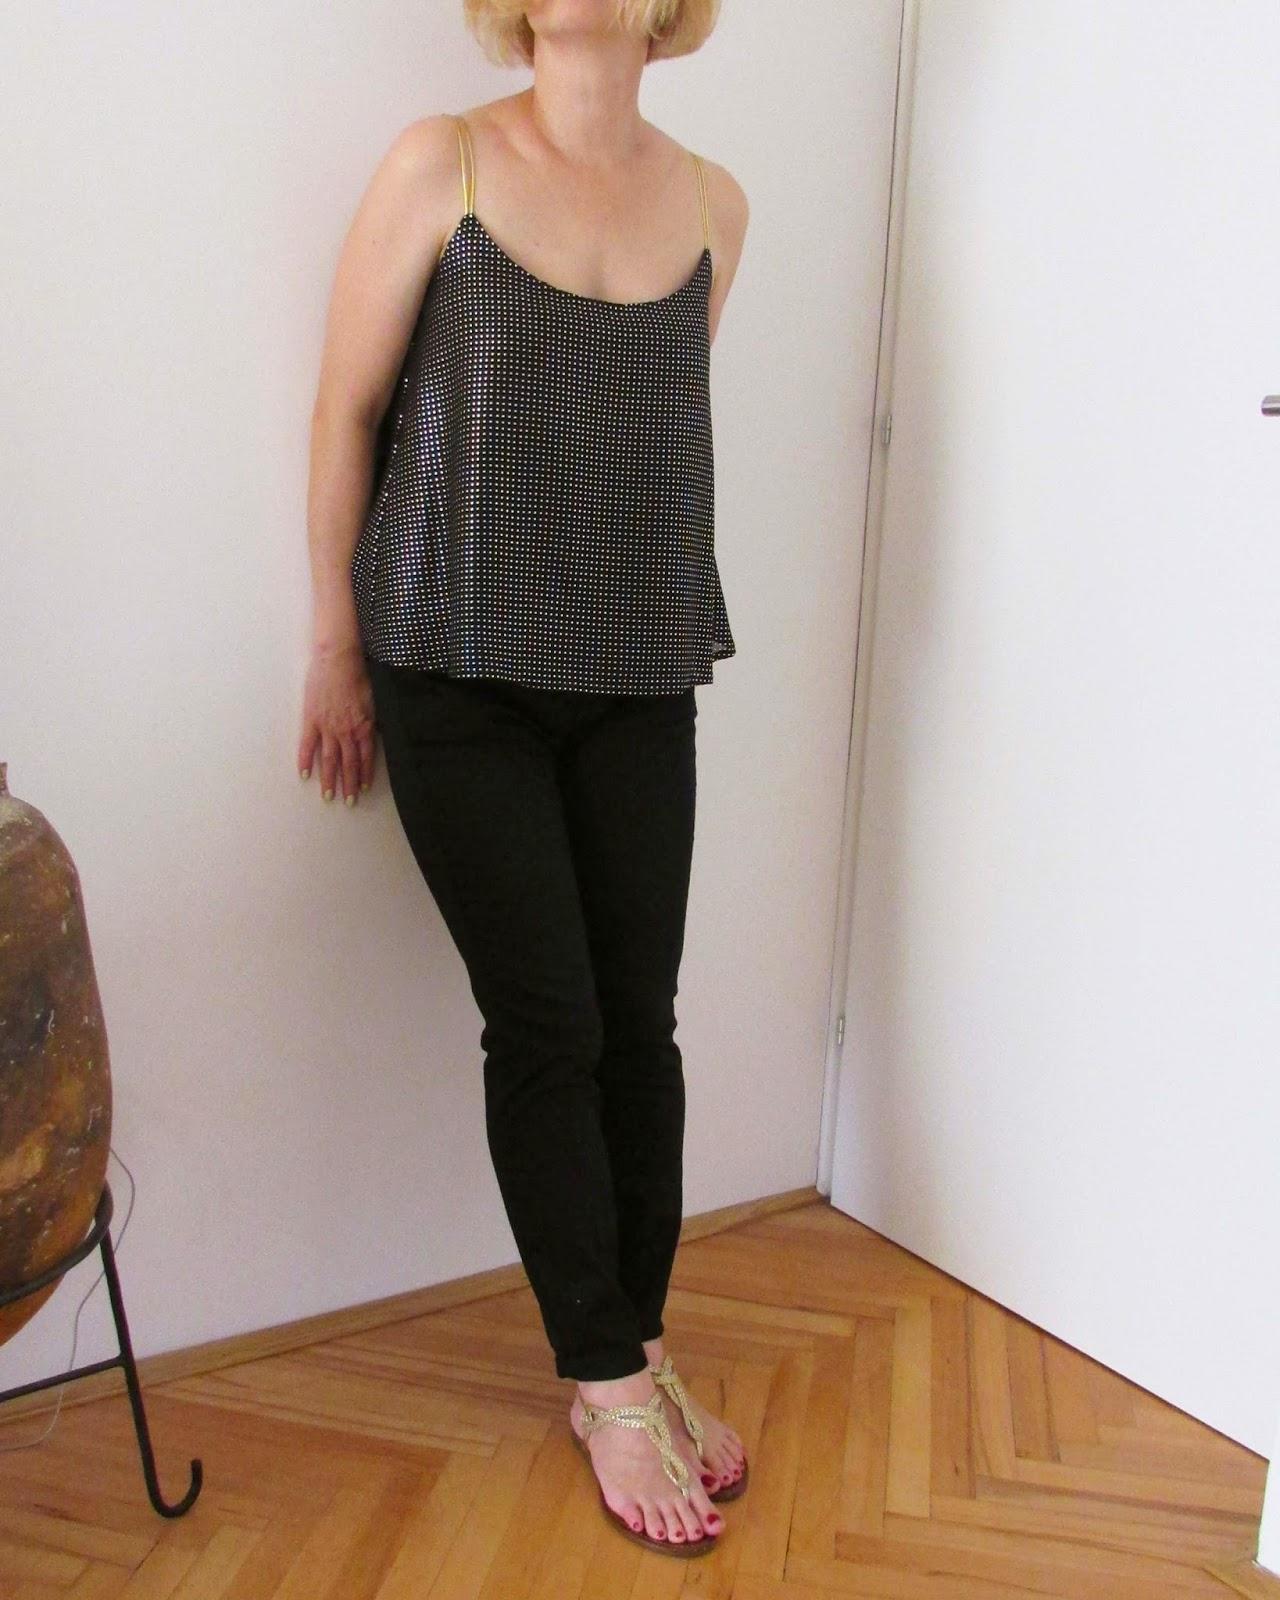 http://ladylinaland.blogspot.com/2014/08/metallic-tops.html